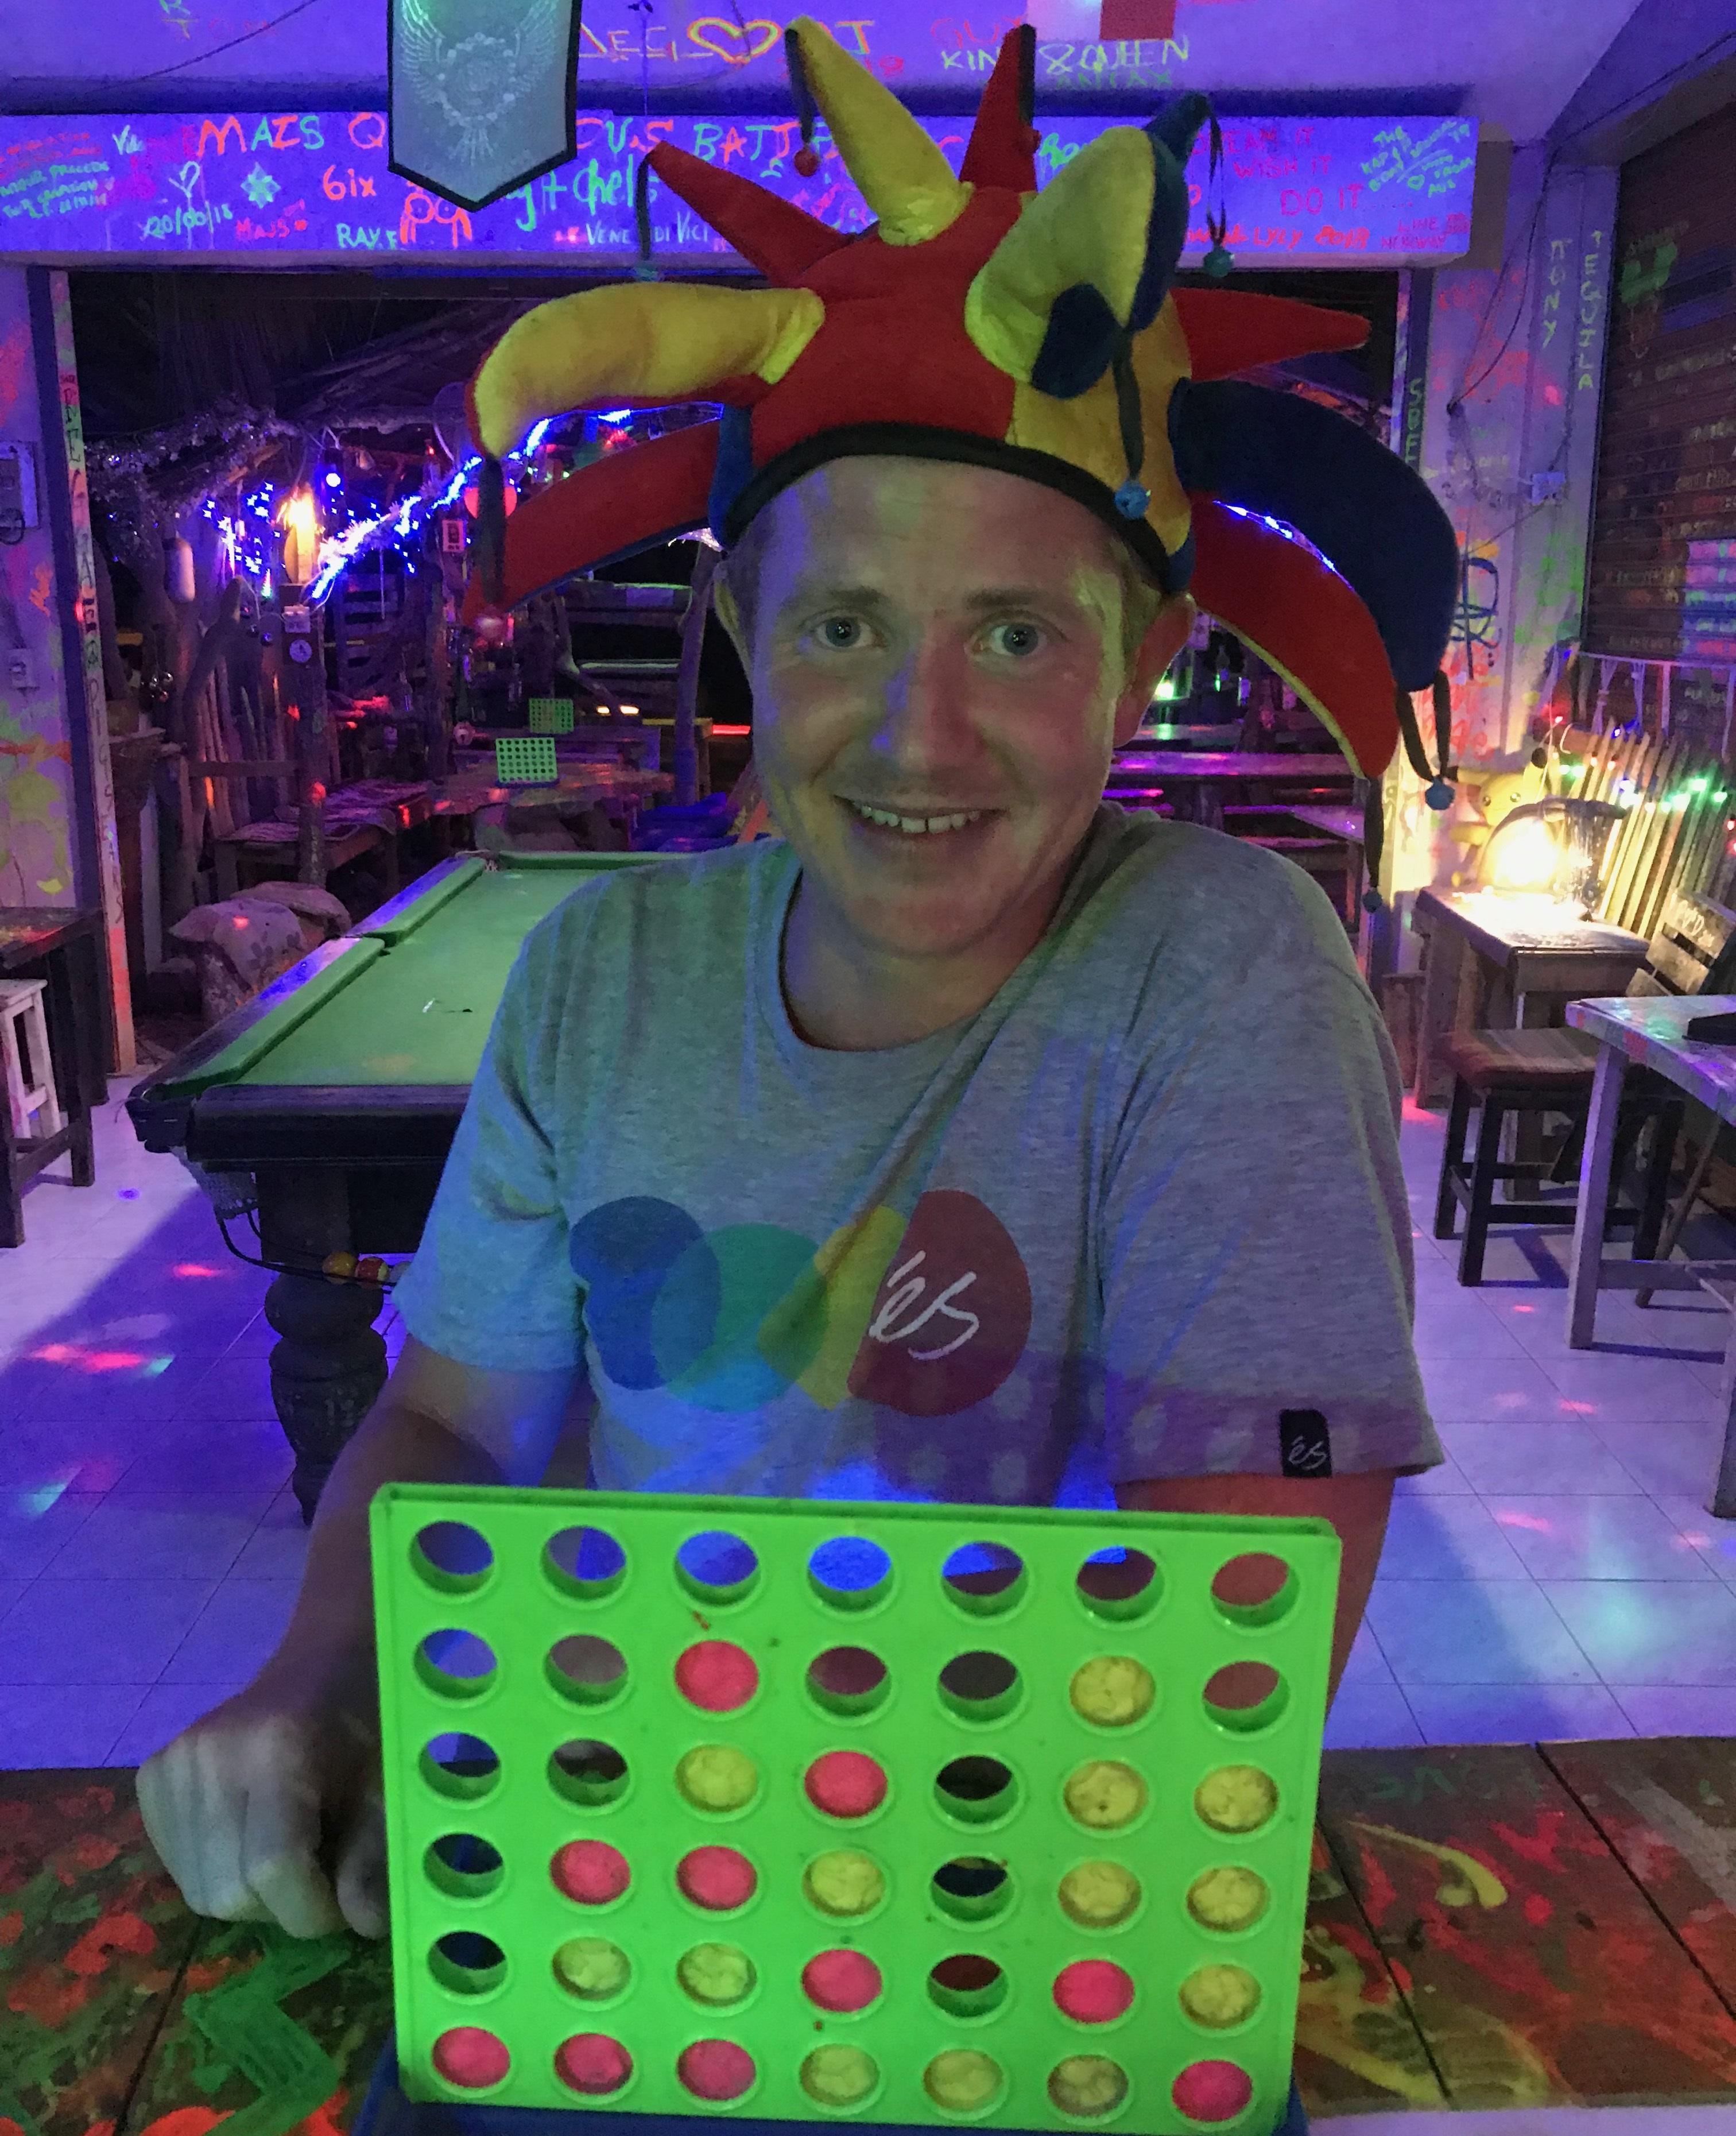 Roy at the mushroom bar